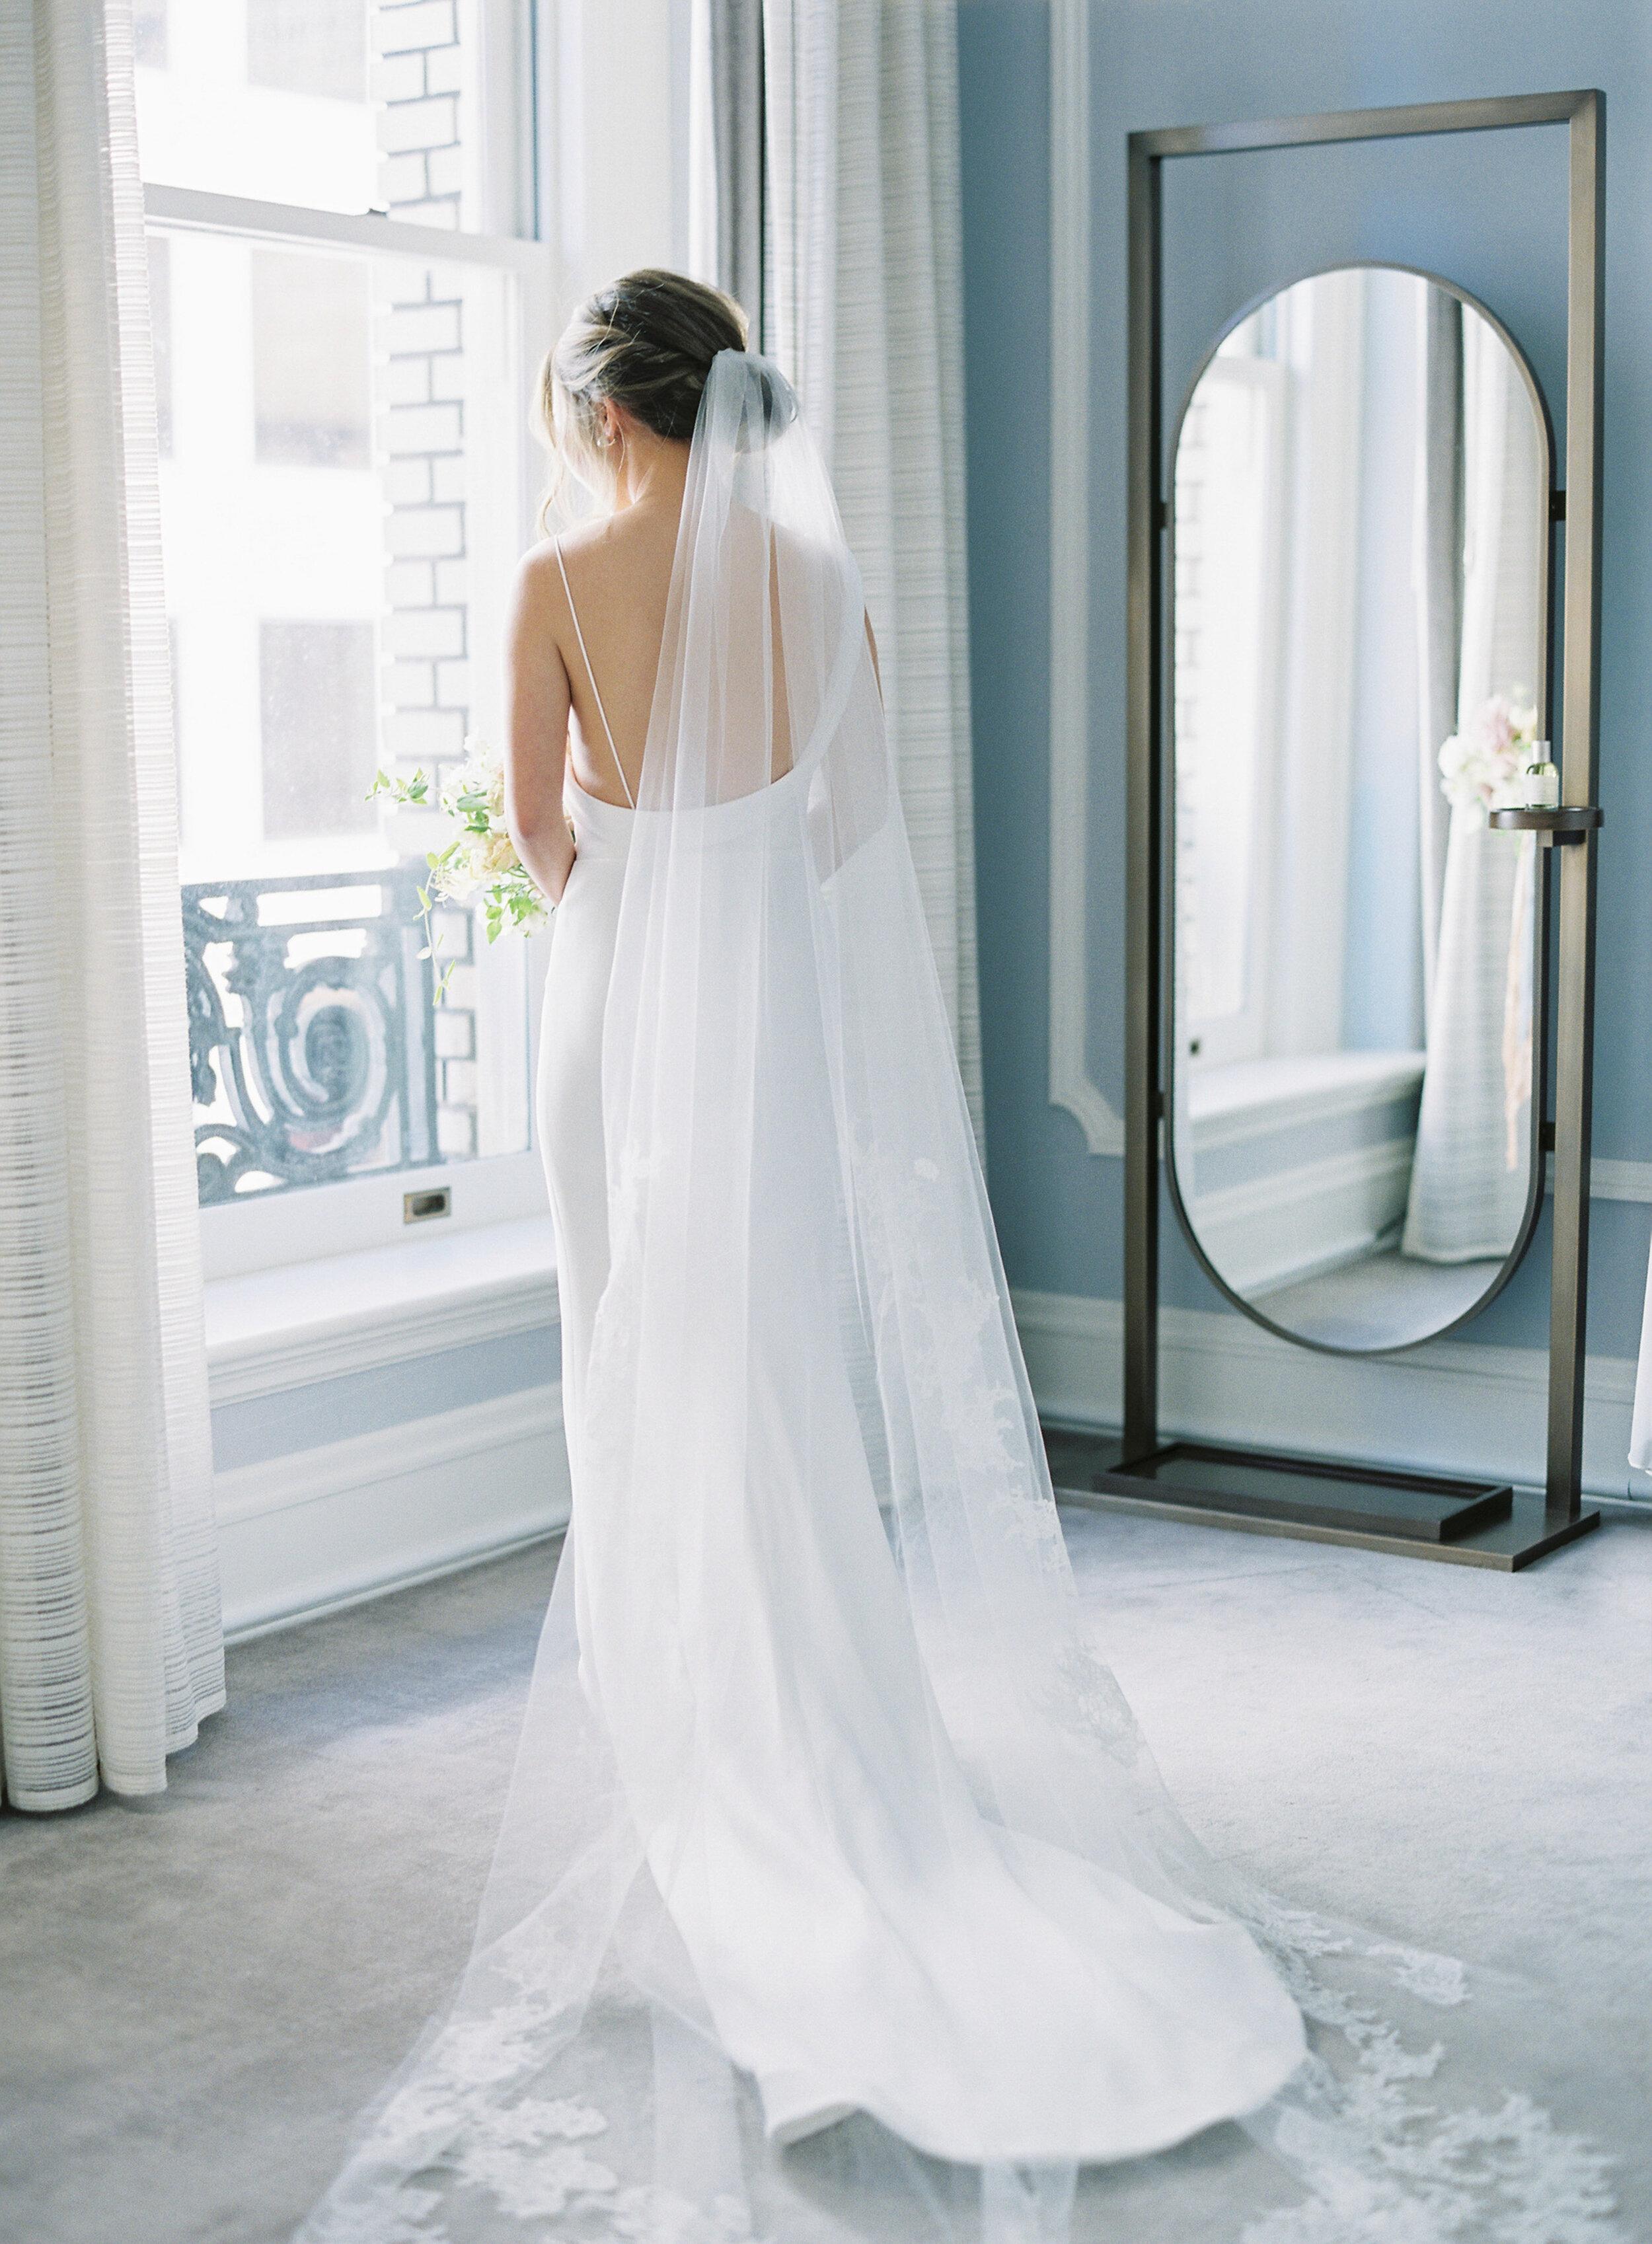 Legion-of-Honor-Wedding-Jen-Huang-33.jpg